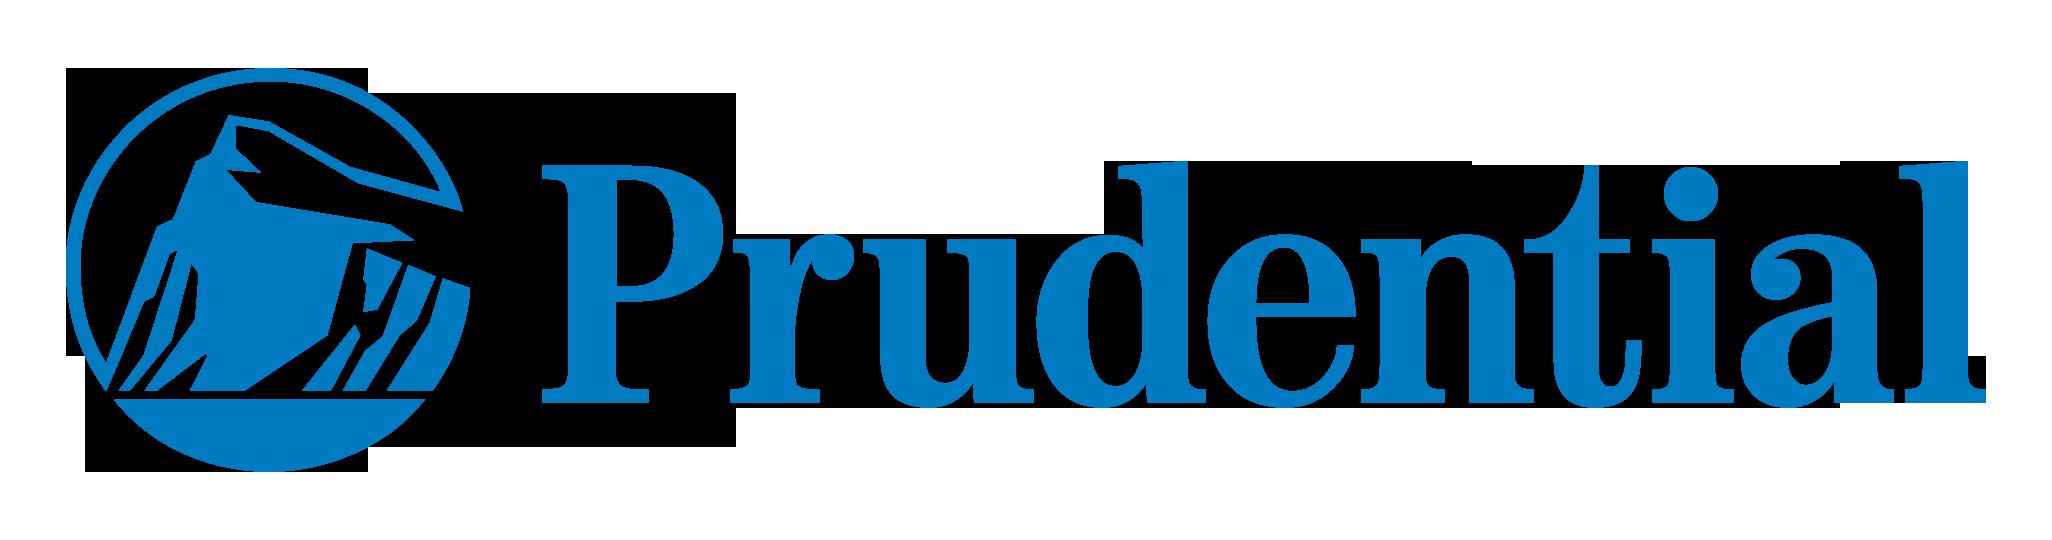 PNGPIX-COM-Prudential-Logo-PNG-Transparent-1.png